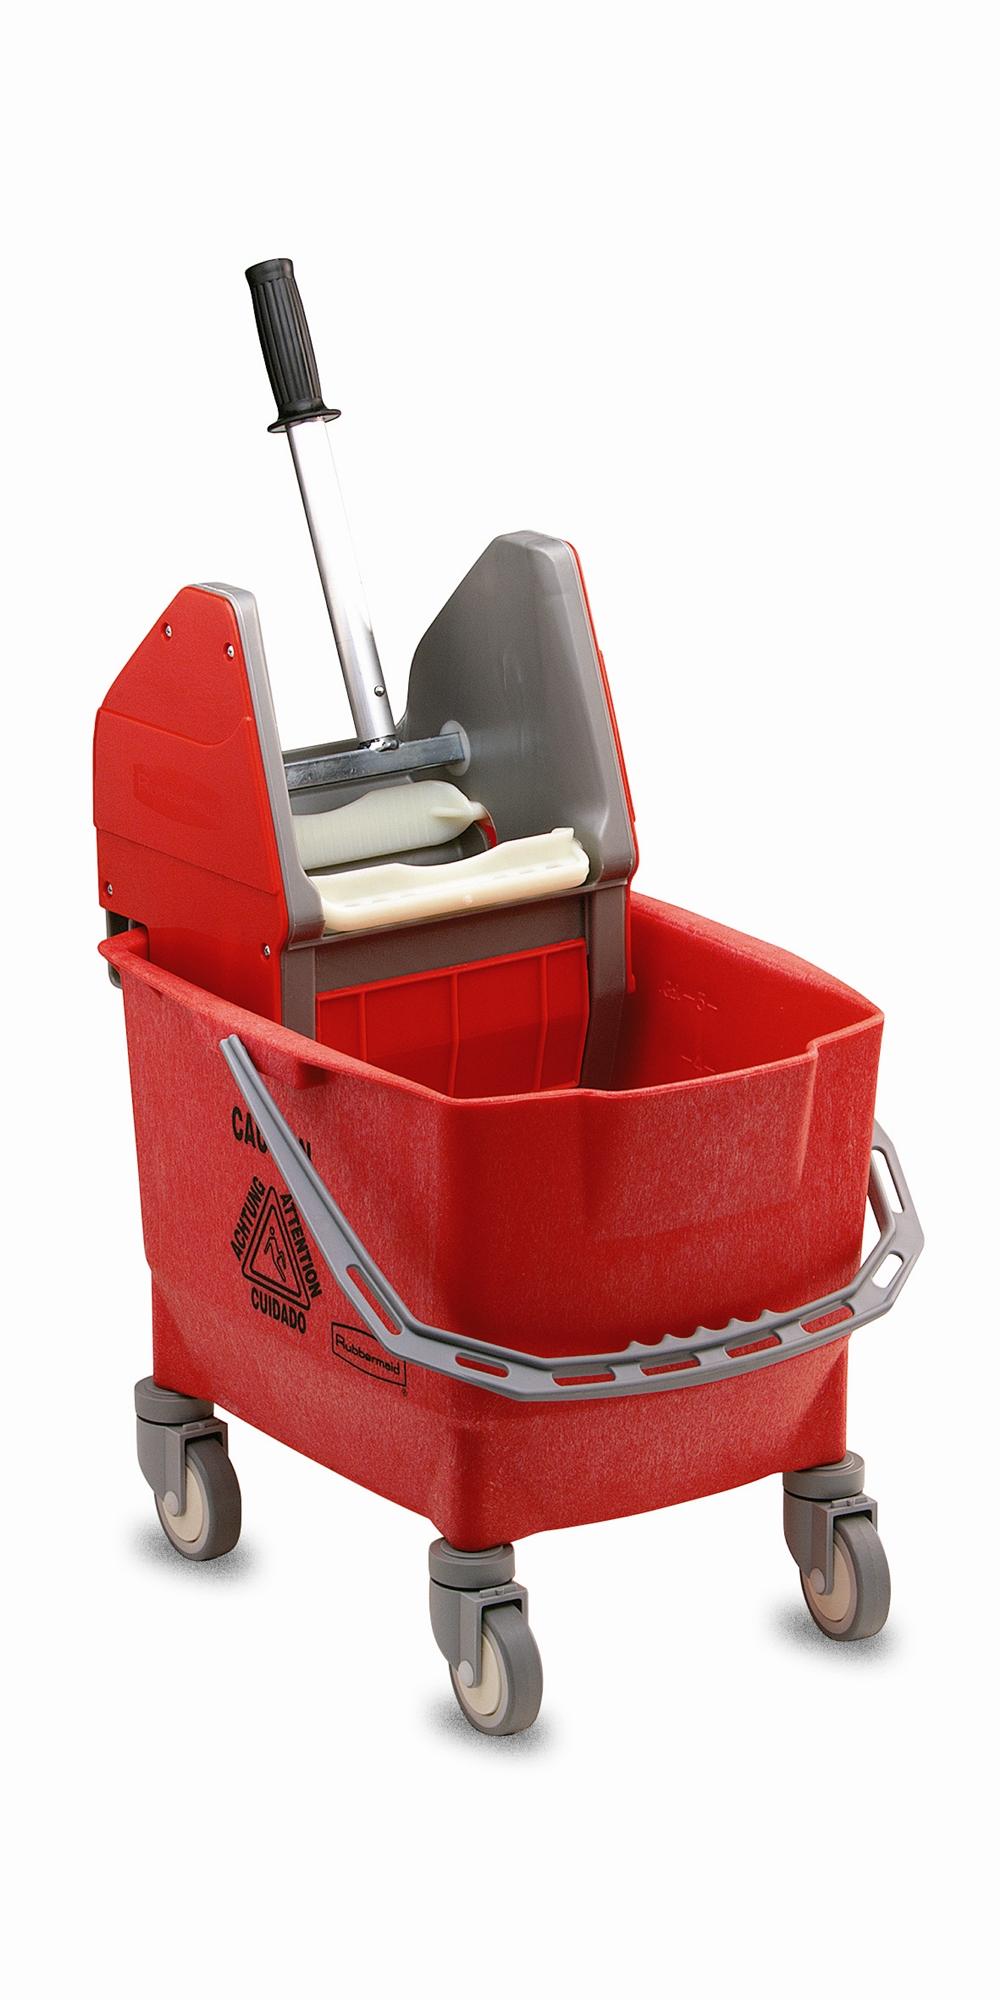 Chariot de menage rubbermaid combo bravo 25 l rouge avec presse for Chariot de menage rubbermaid